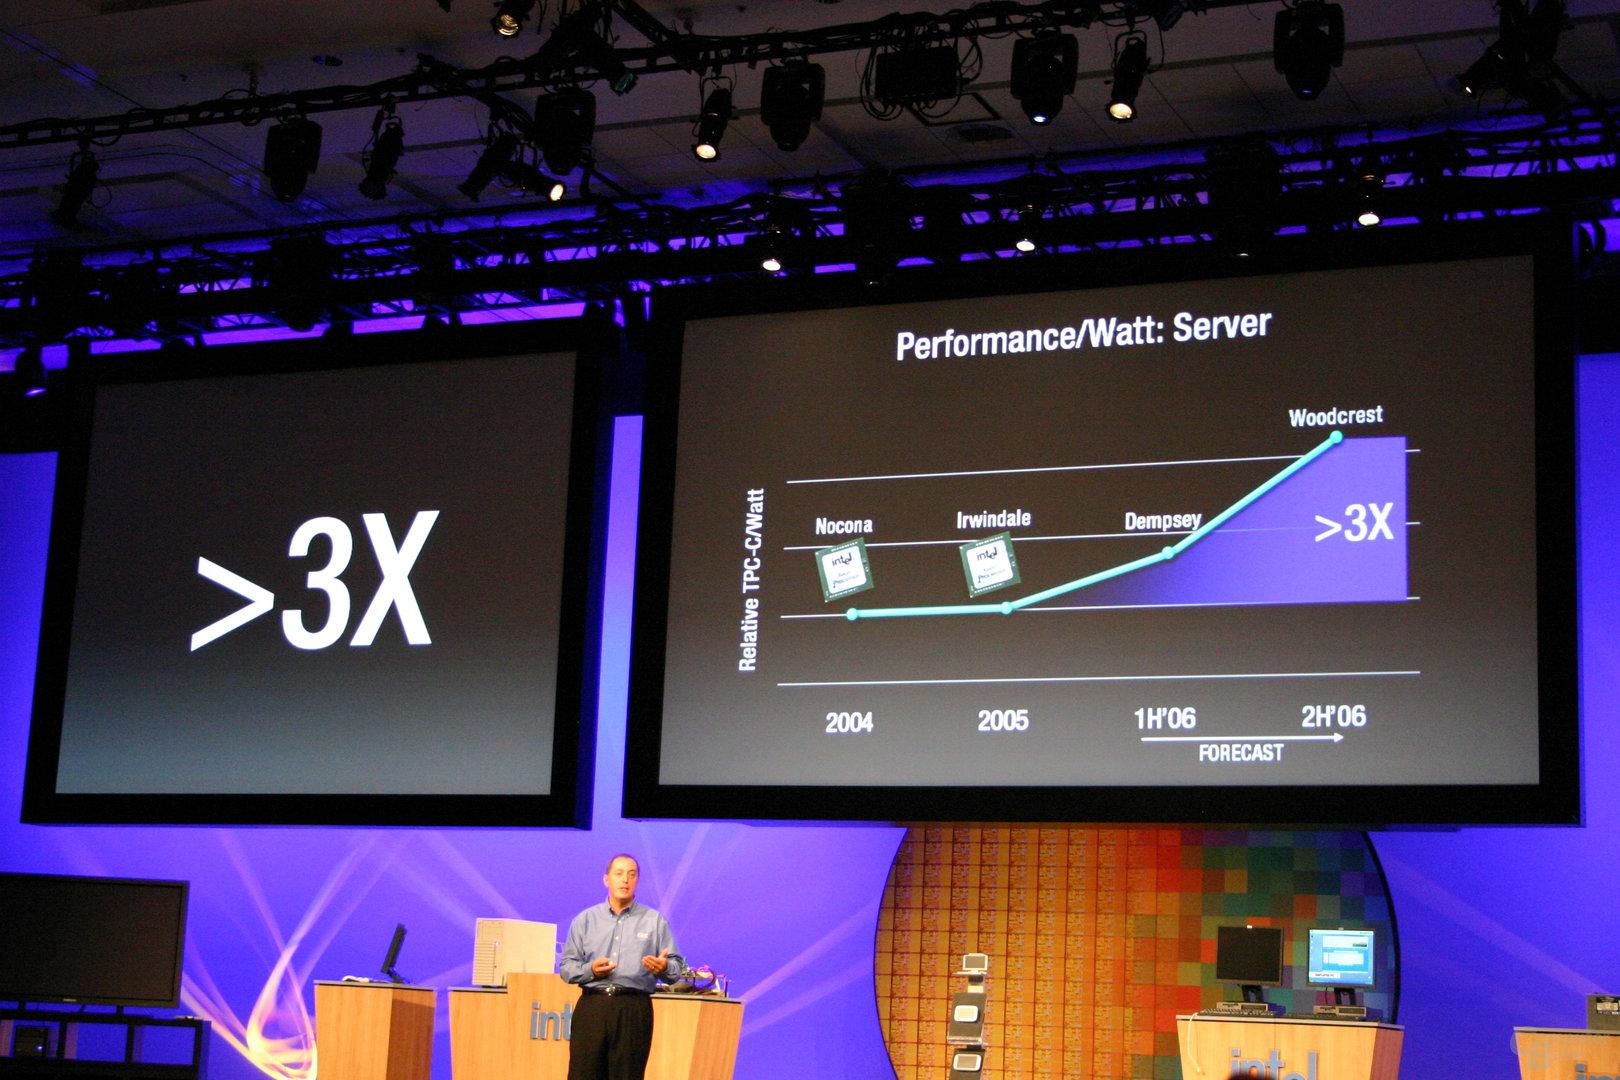 Performance/Watt Server